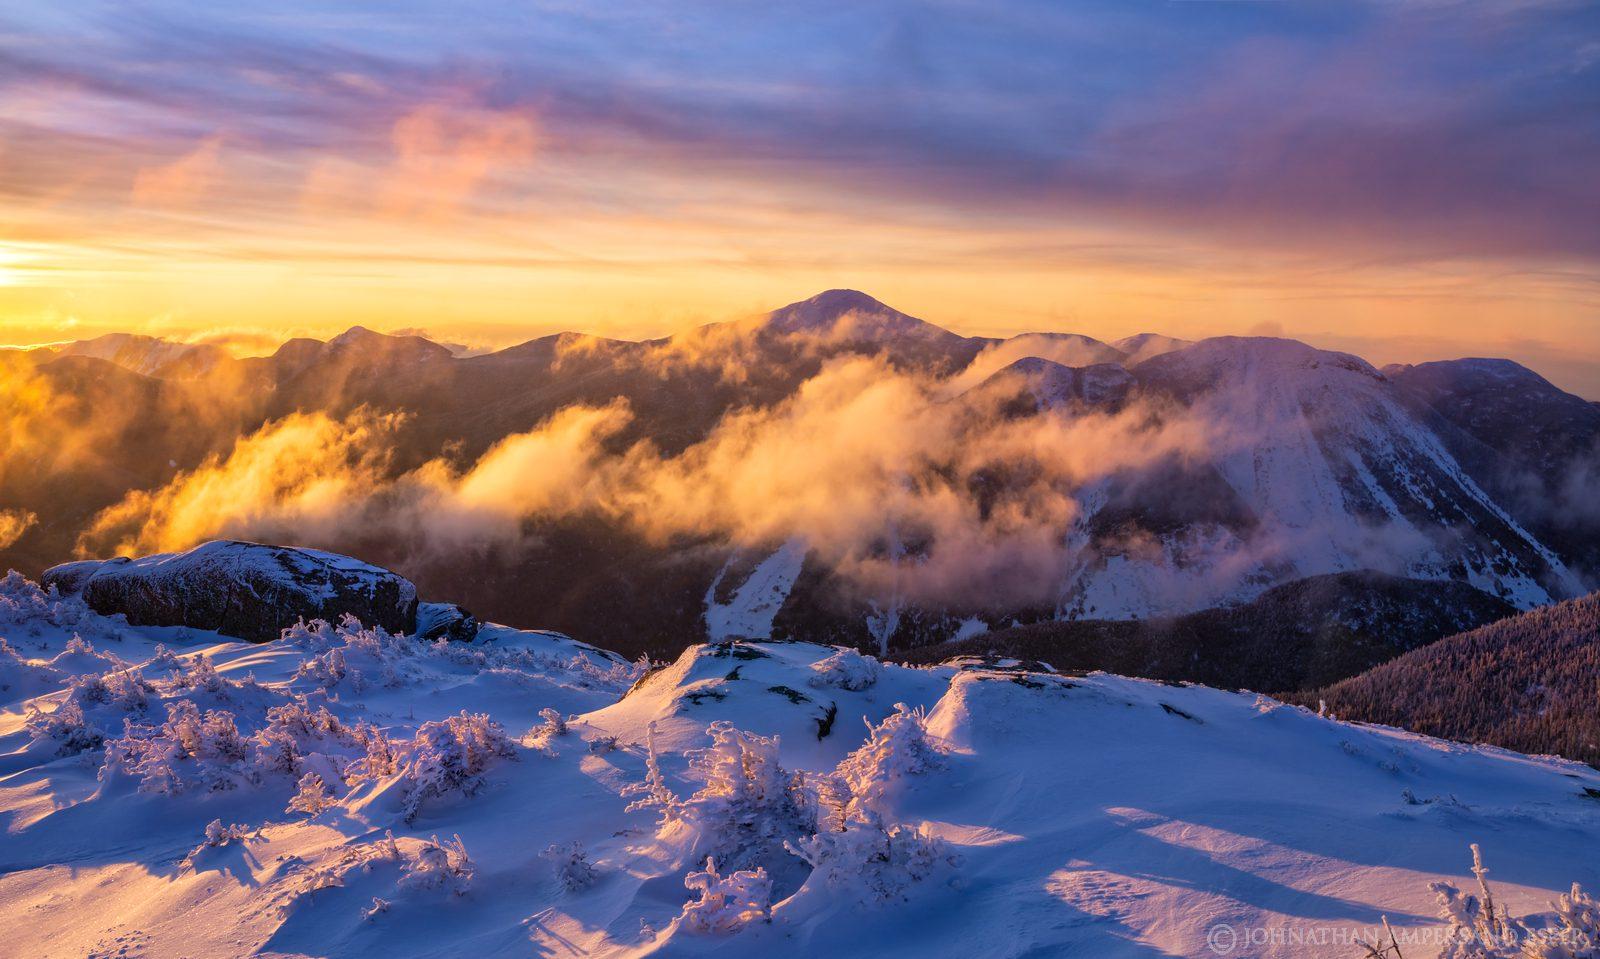 Mt Marcy,Mt. Marcy,Colden,High Peaks,winter 2020,2020,winter,snow,Adirondack Mountains,Adirondacks,sunrise,Wright Peak,Wright...